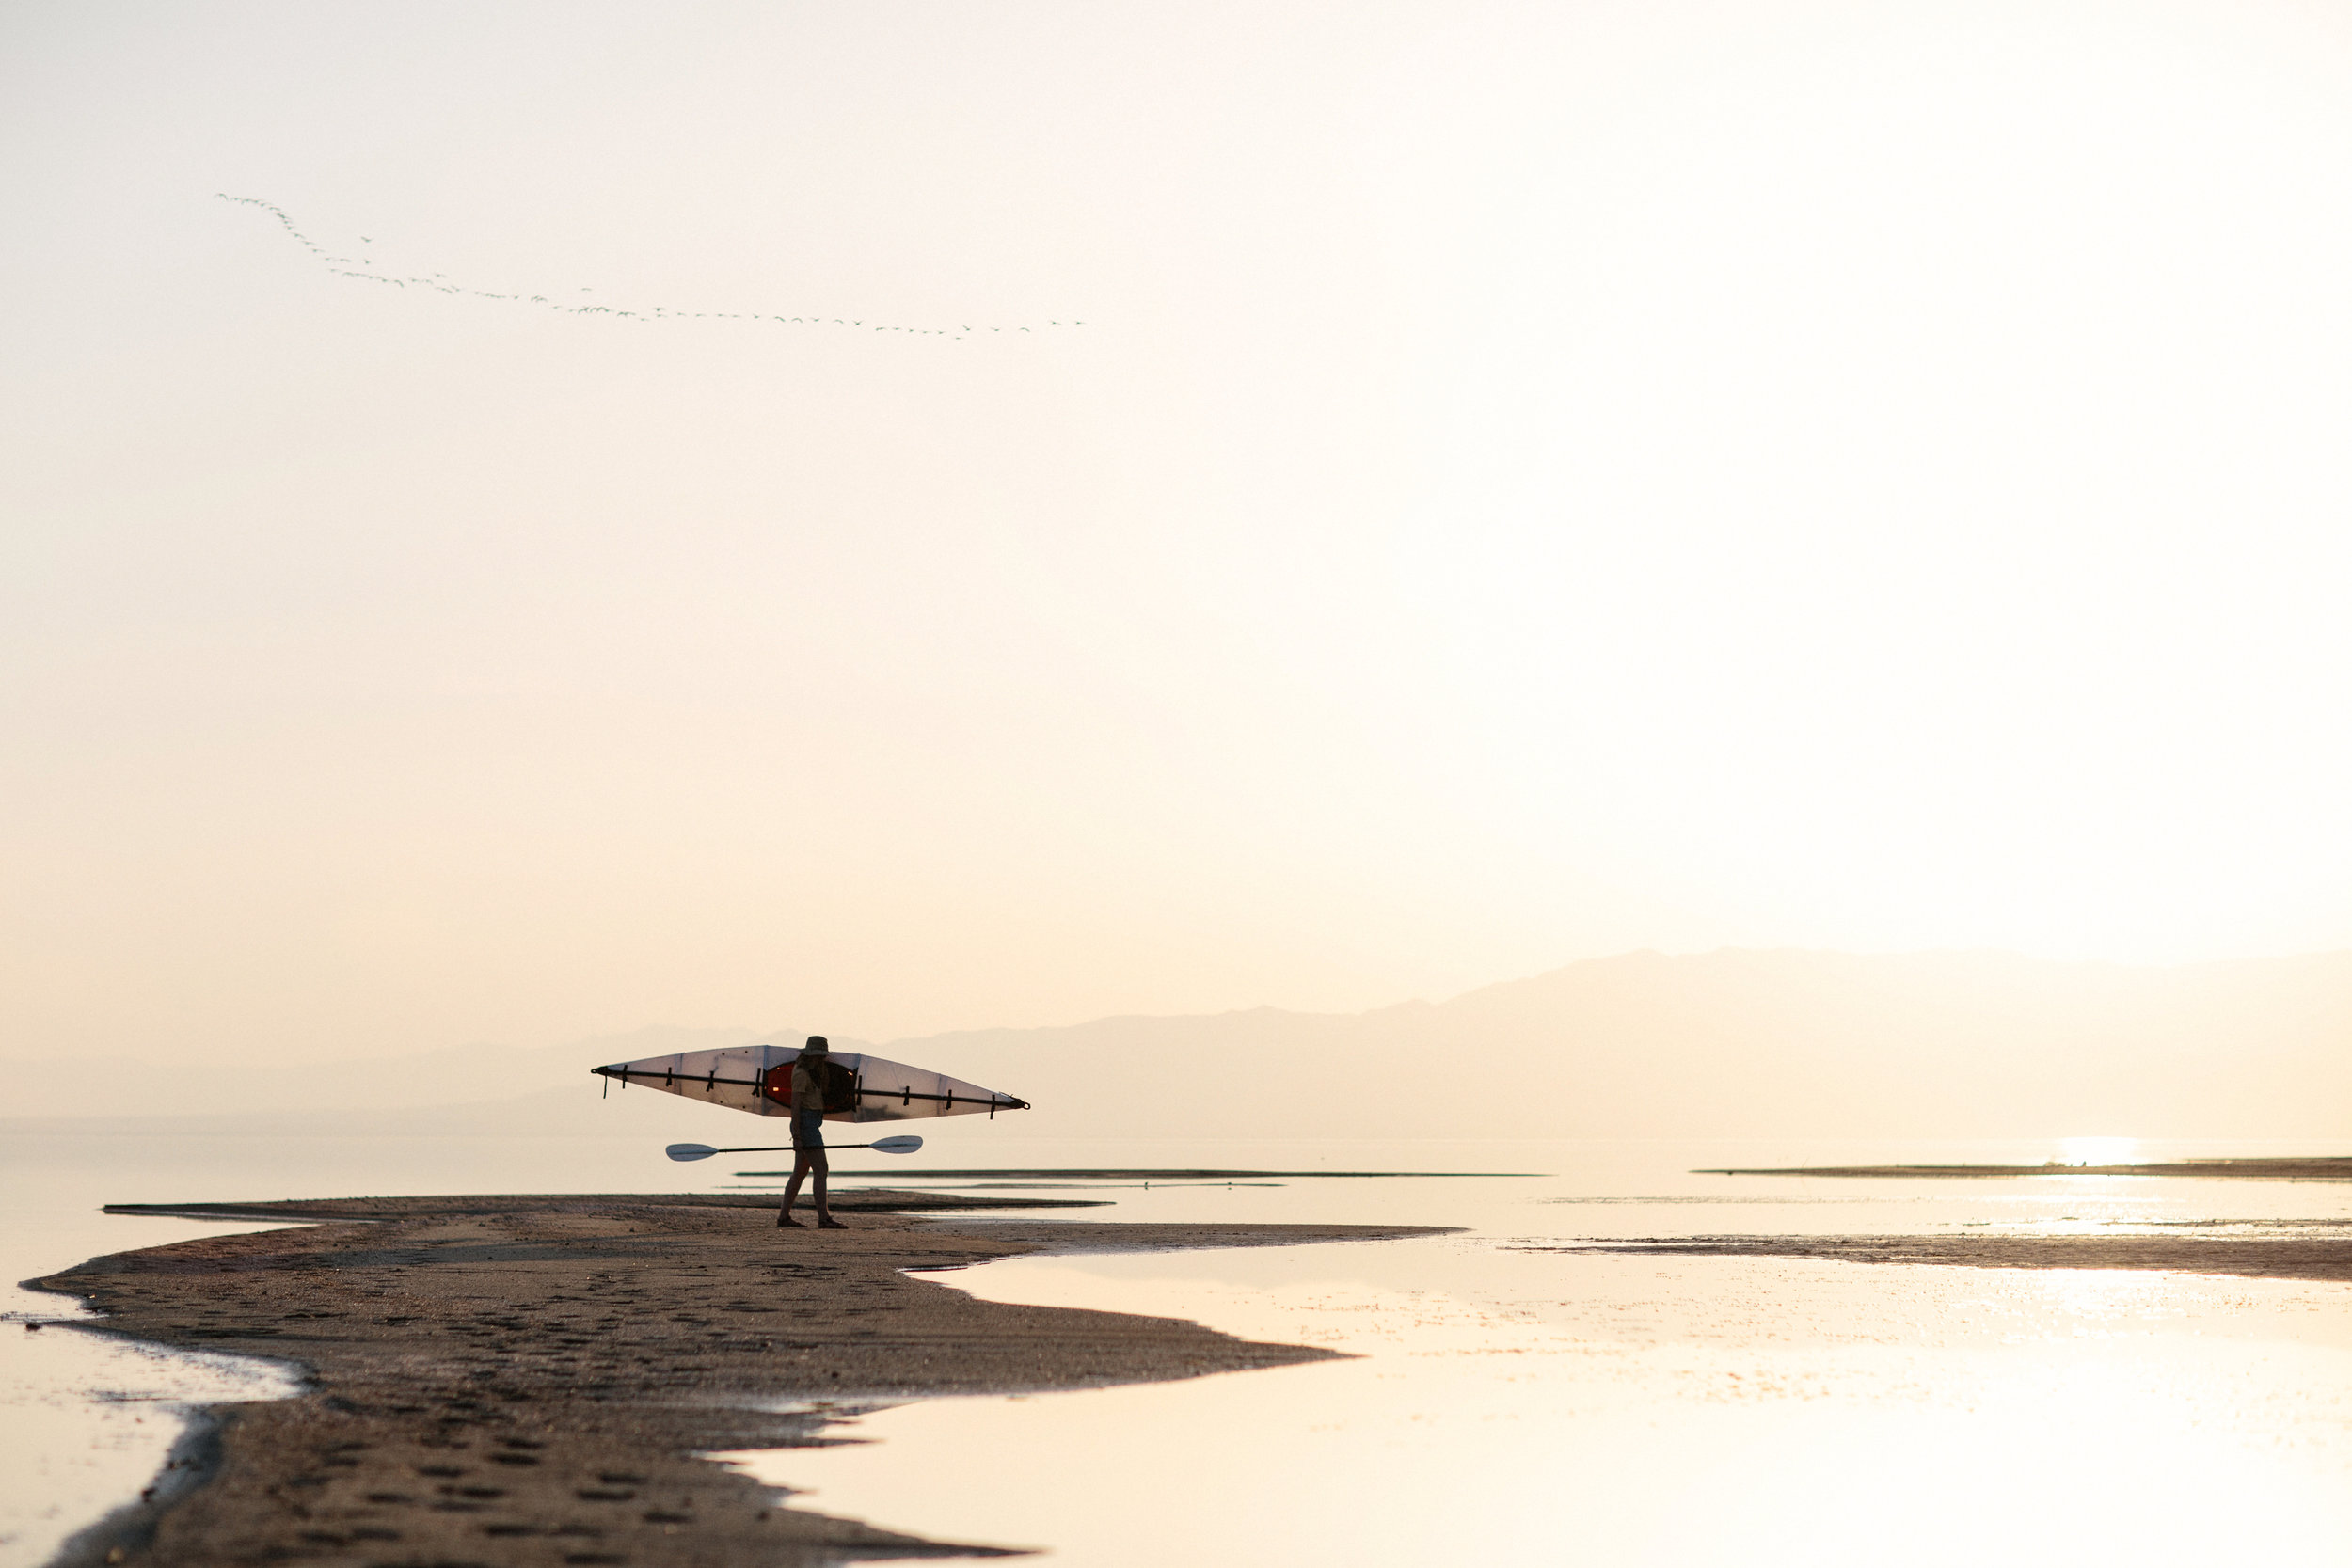 04:11 --Balkin_Oru Kayak_Salton Sea-0009.jpg